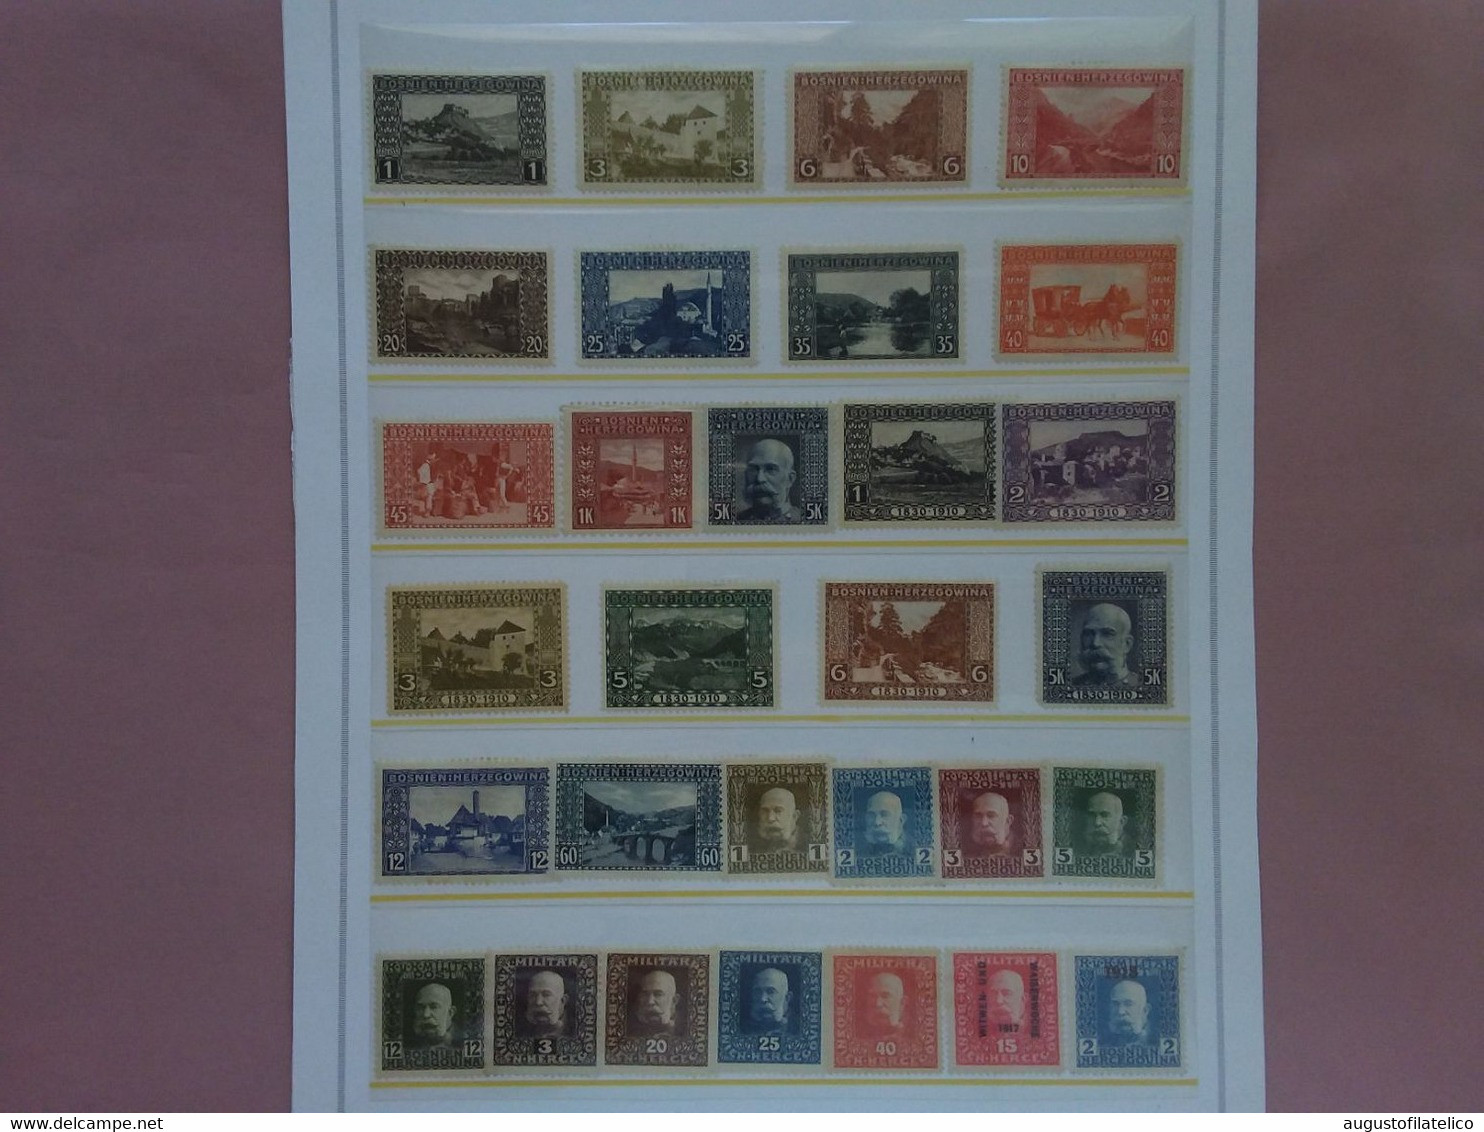 AUSTRIA 1906/18 - Bosnia Erzegovina - Lotto 30 Francobolli Differenti Nuovi * + Spese Postali - Nuevos